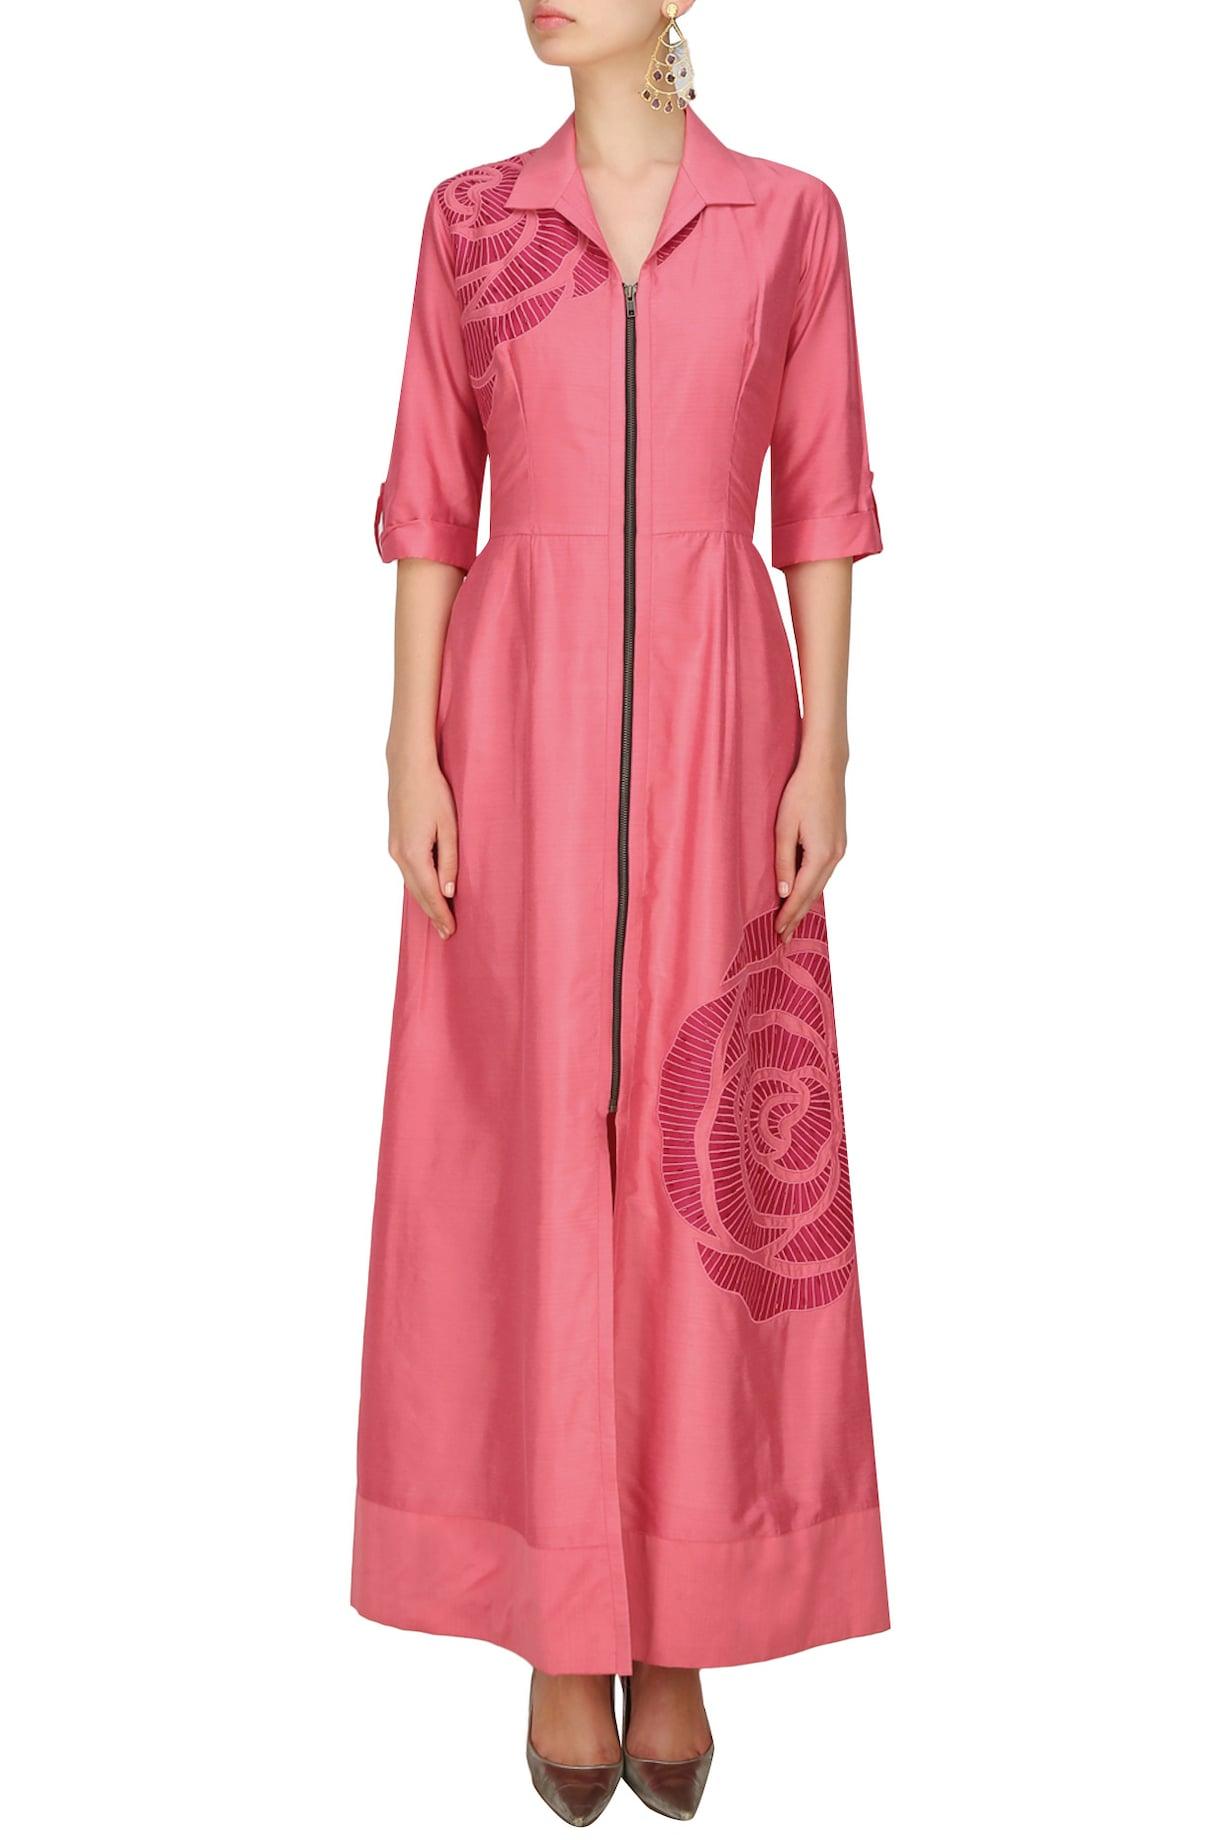 Nachiket Barve Dresses